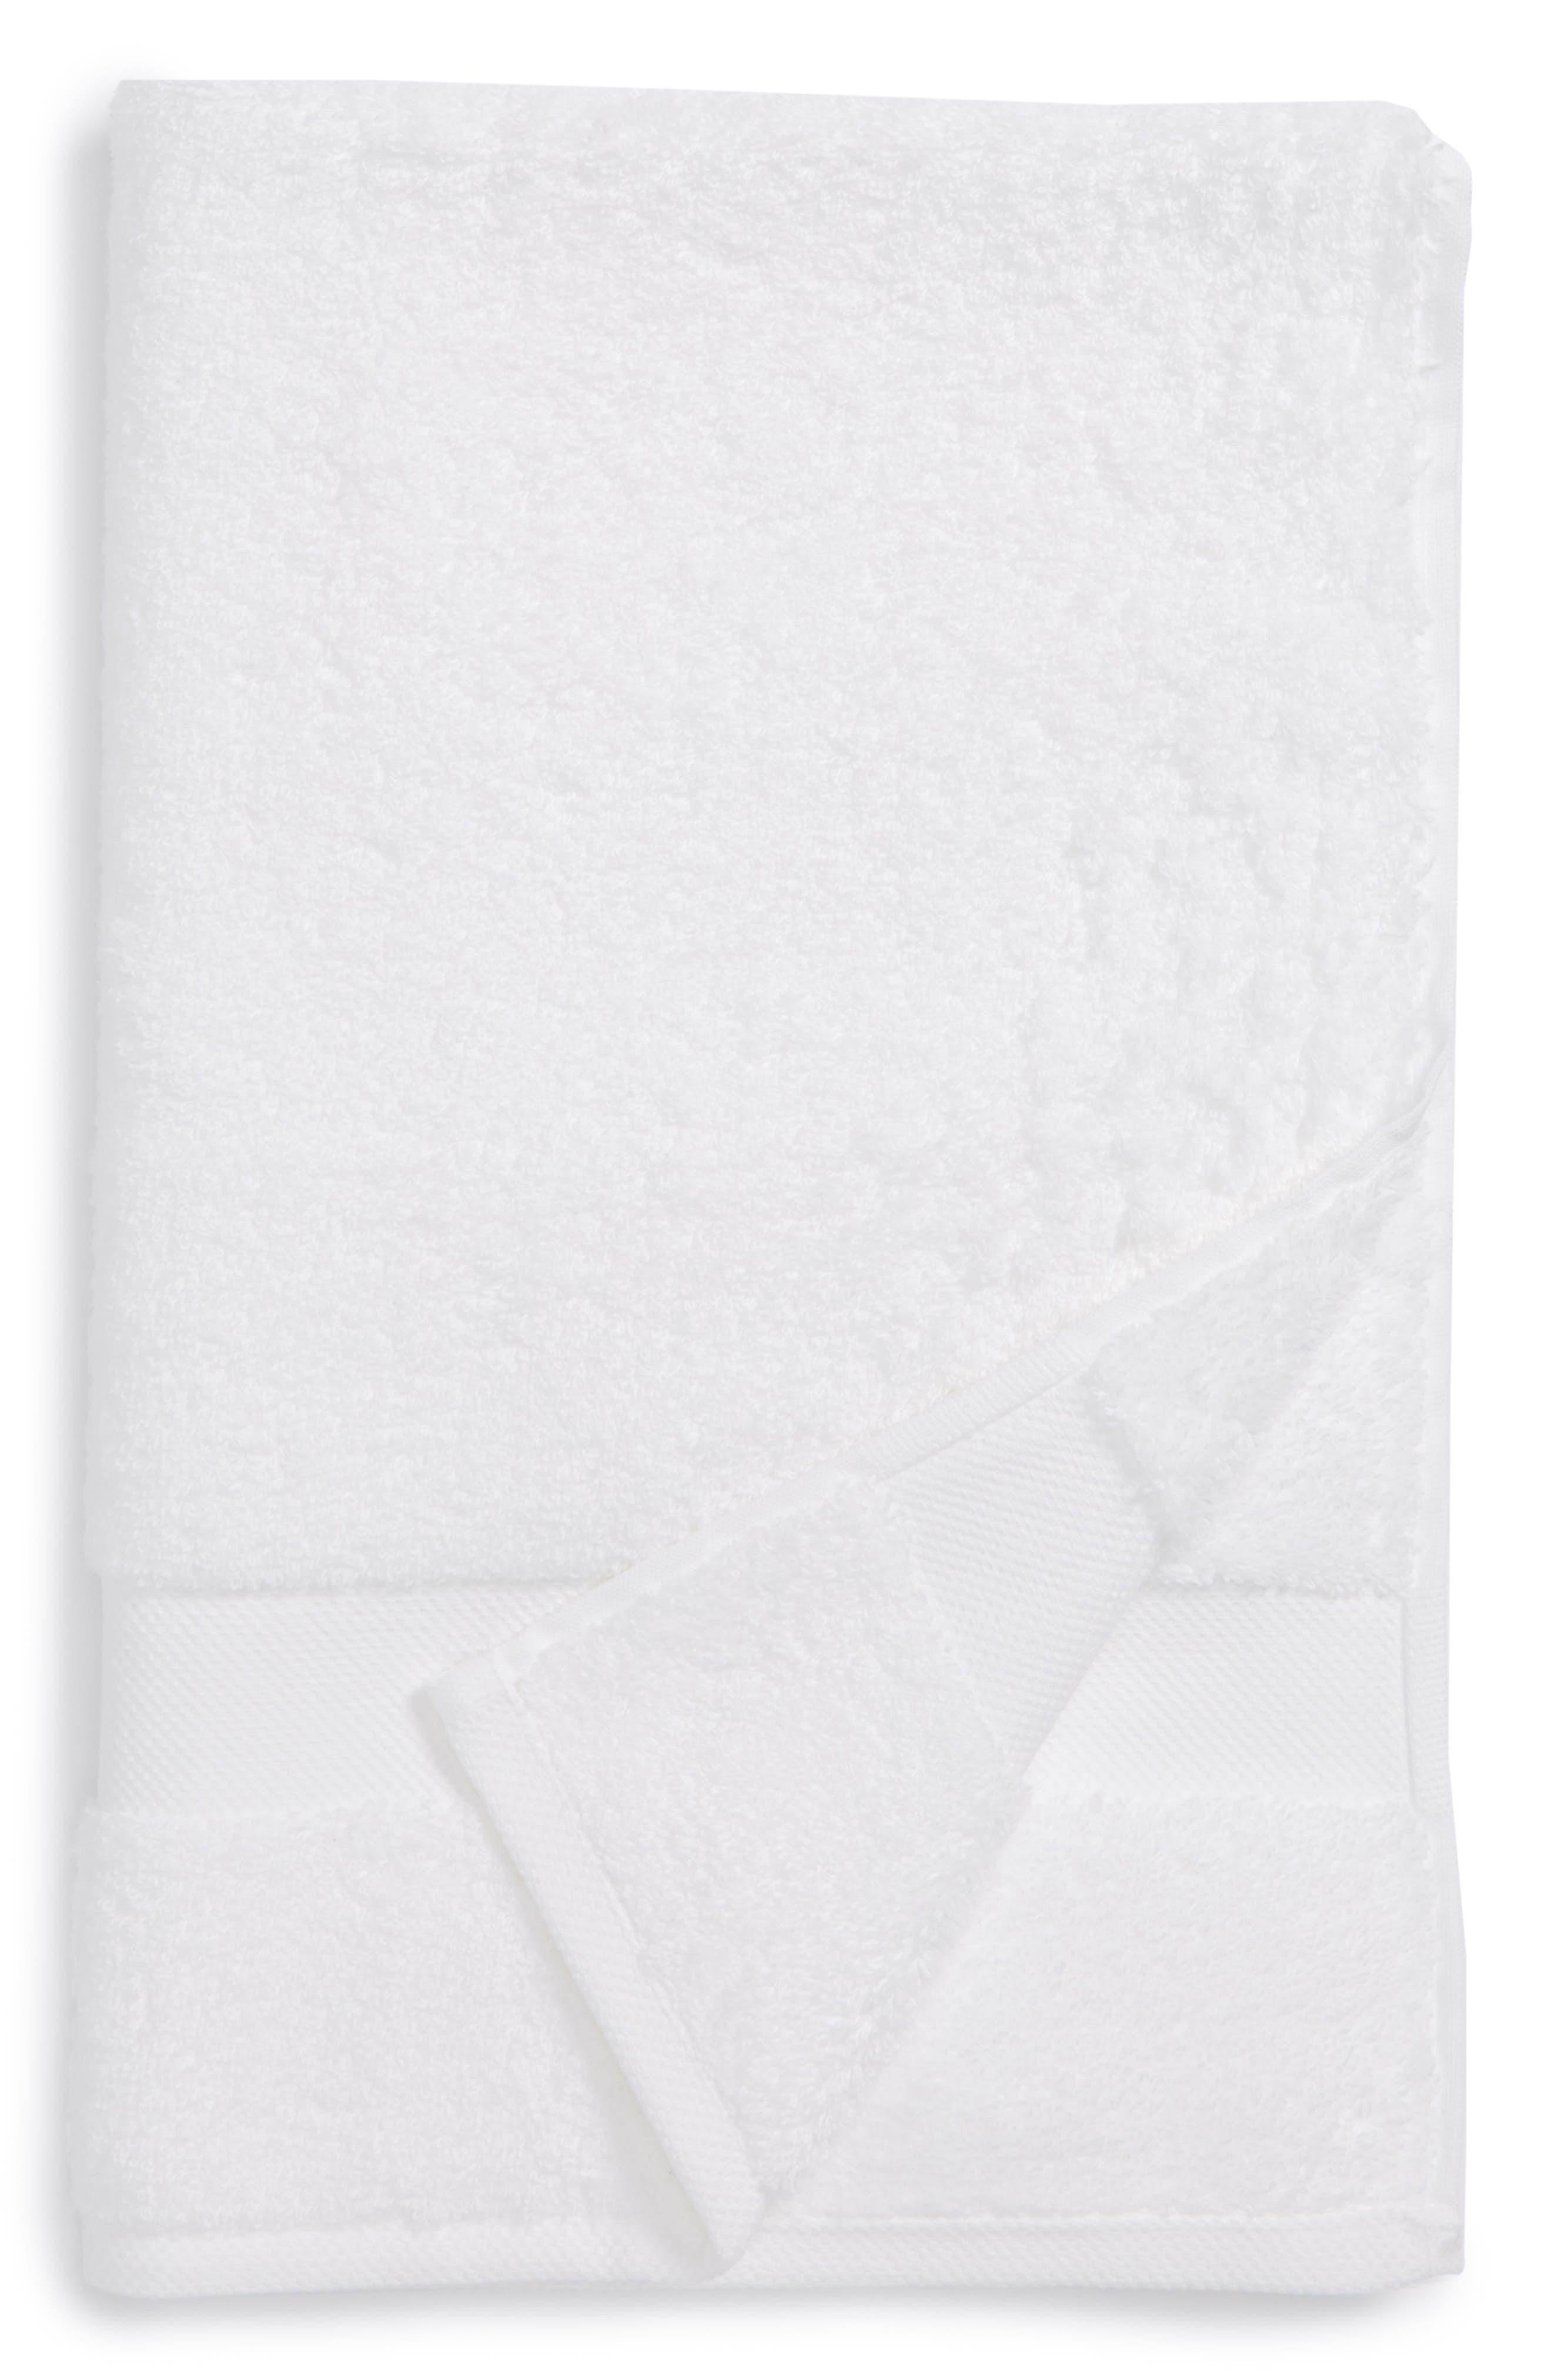 Lotus Hand Towel,                         Main,                         color, WHITE